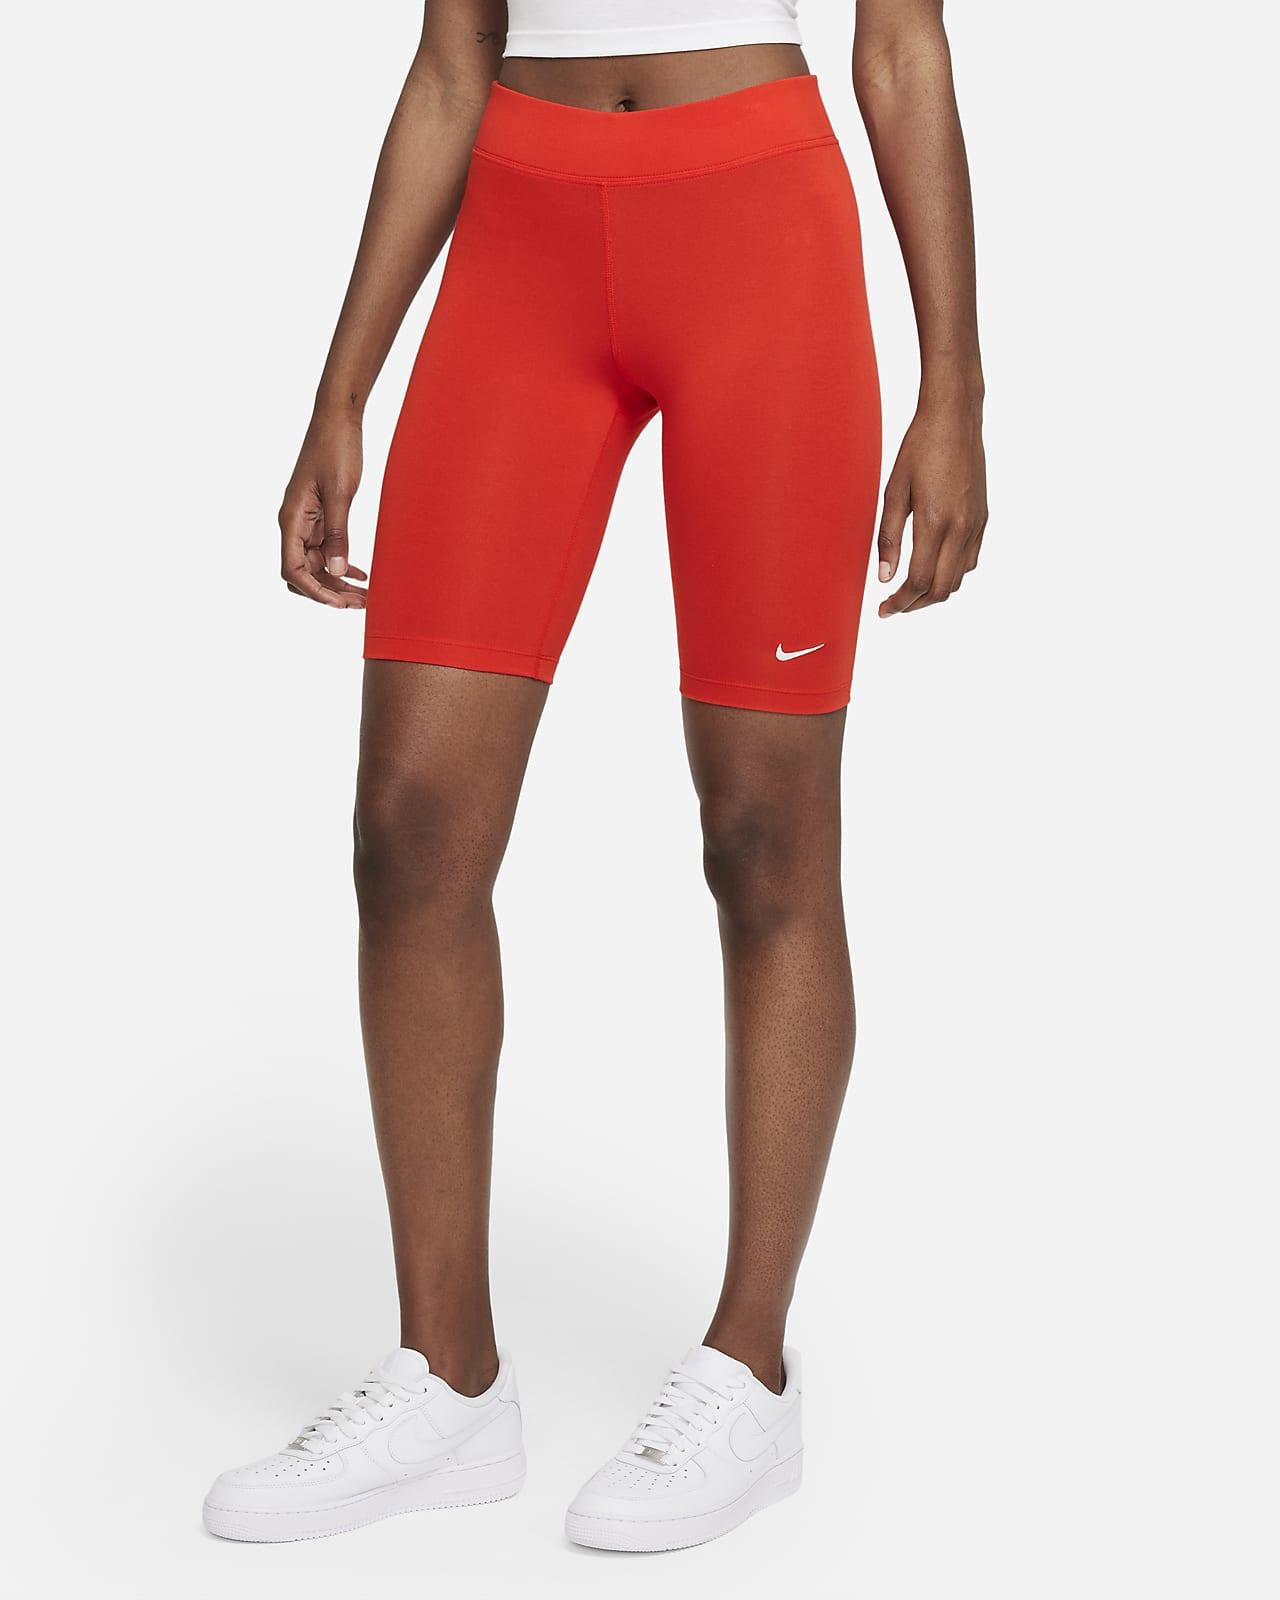 Shorts de ciclismo para mujer Nike Sportswear Essential